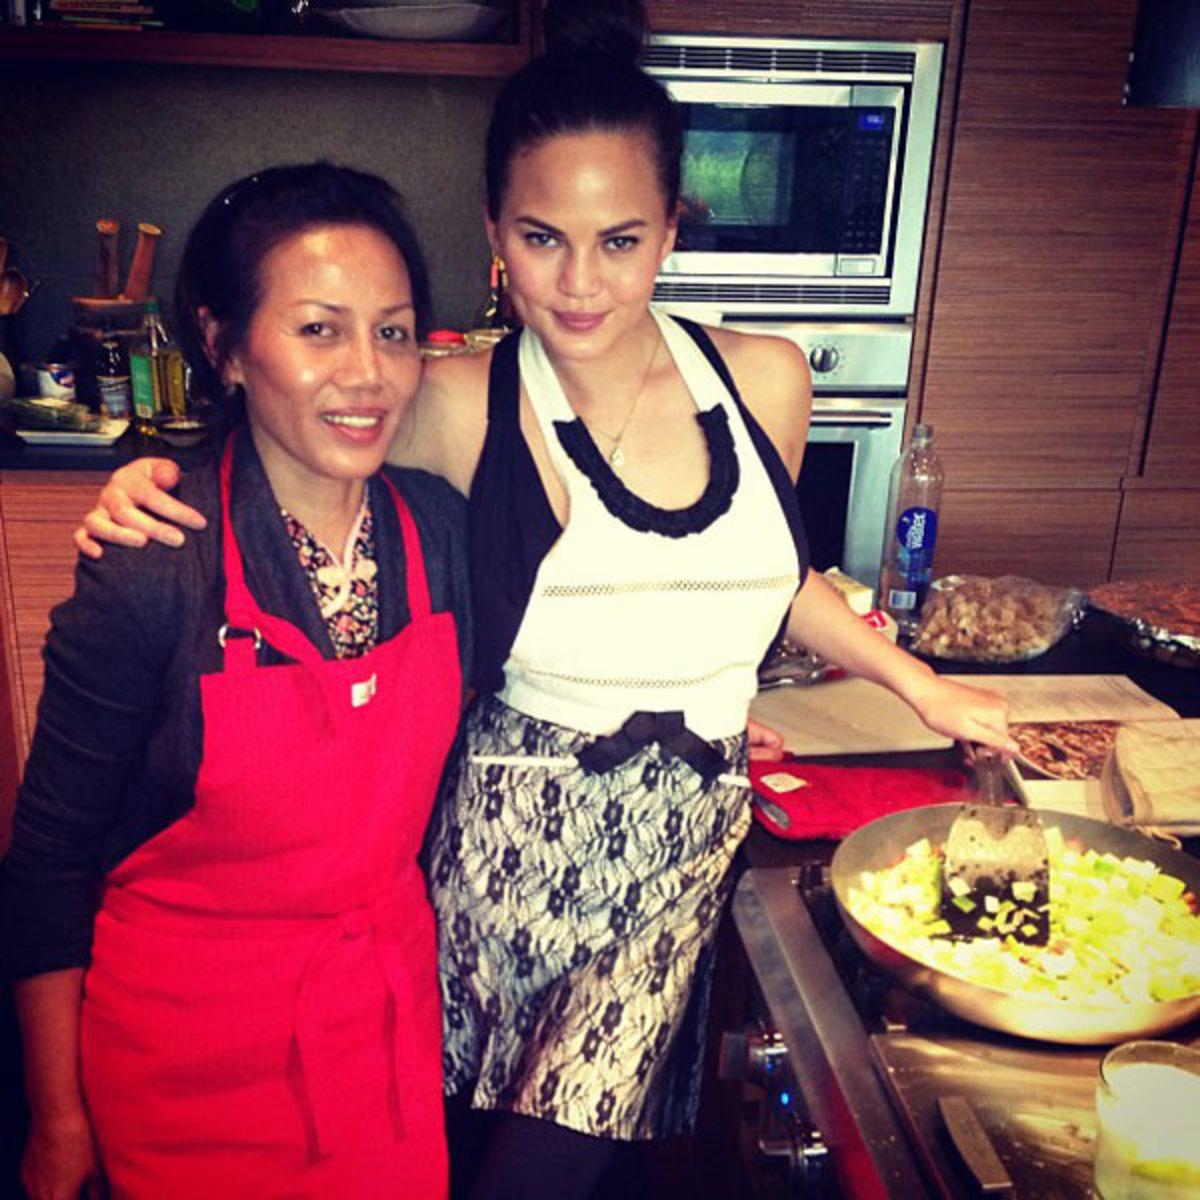 Chrissy and Mama Teigen :: @chrissy_teigen